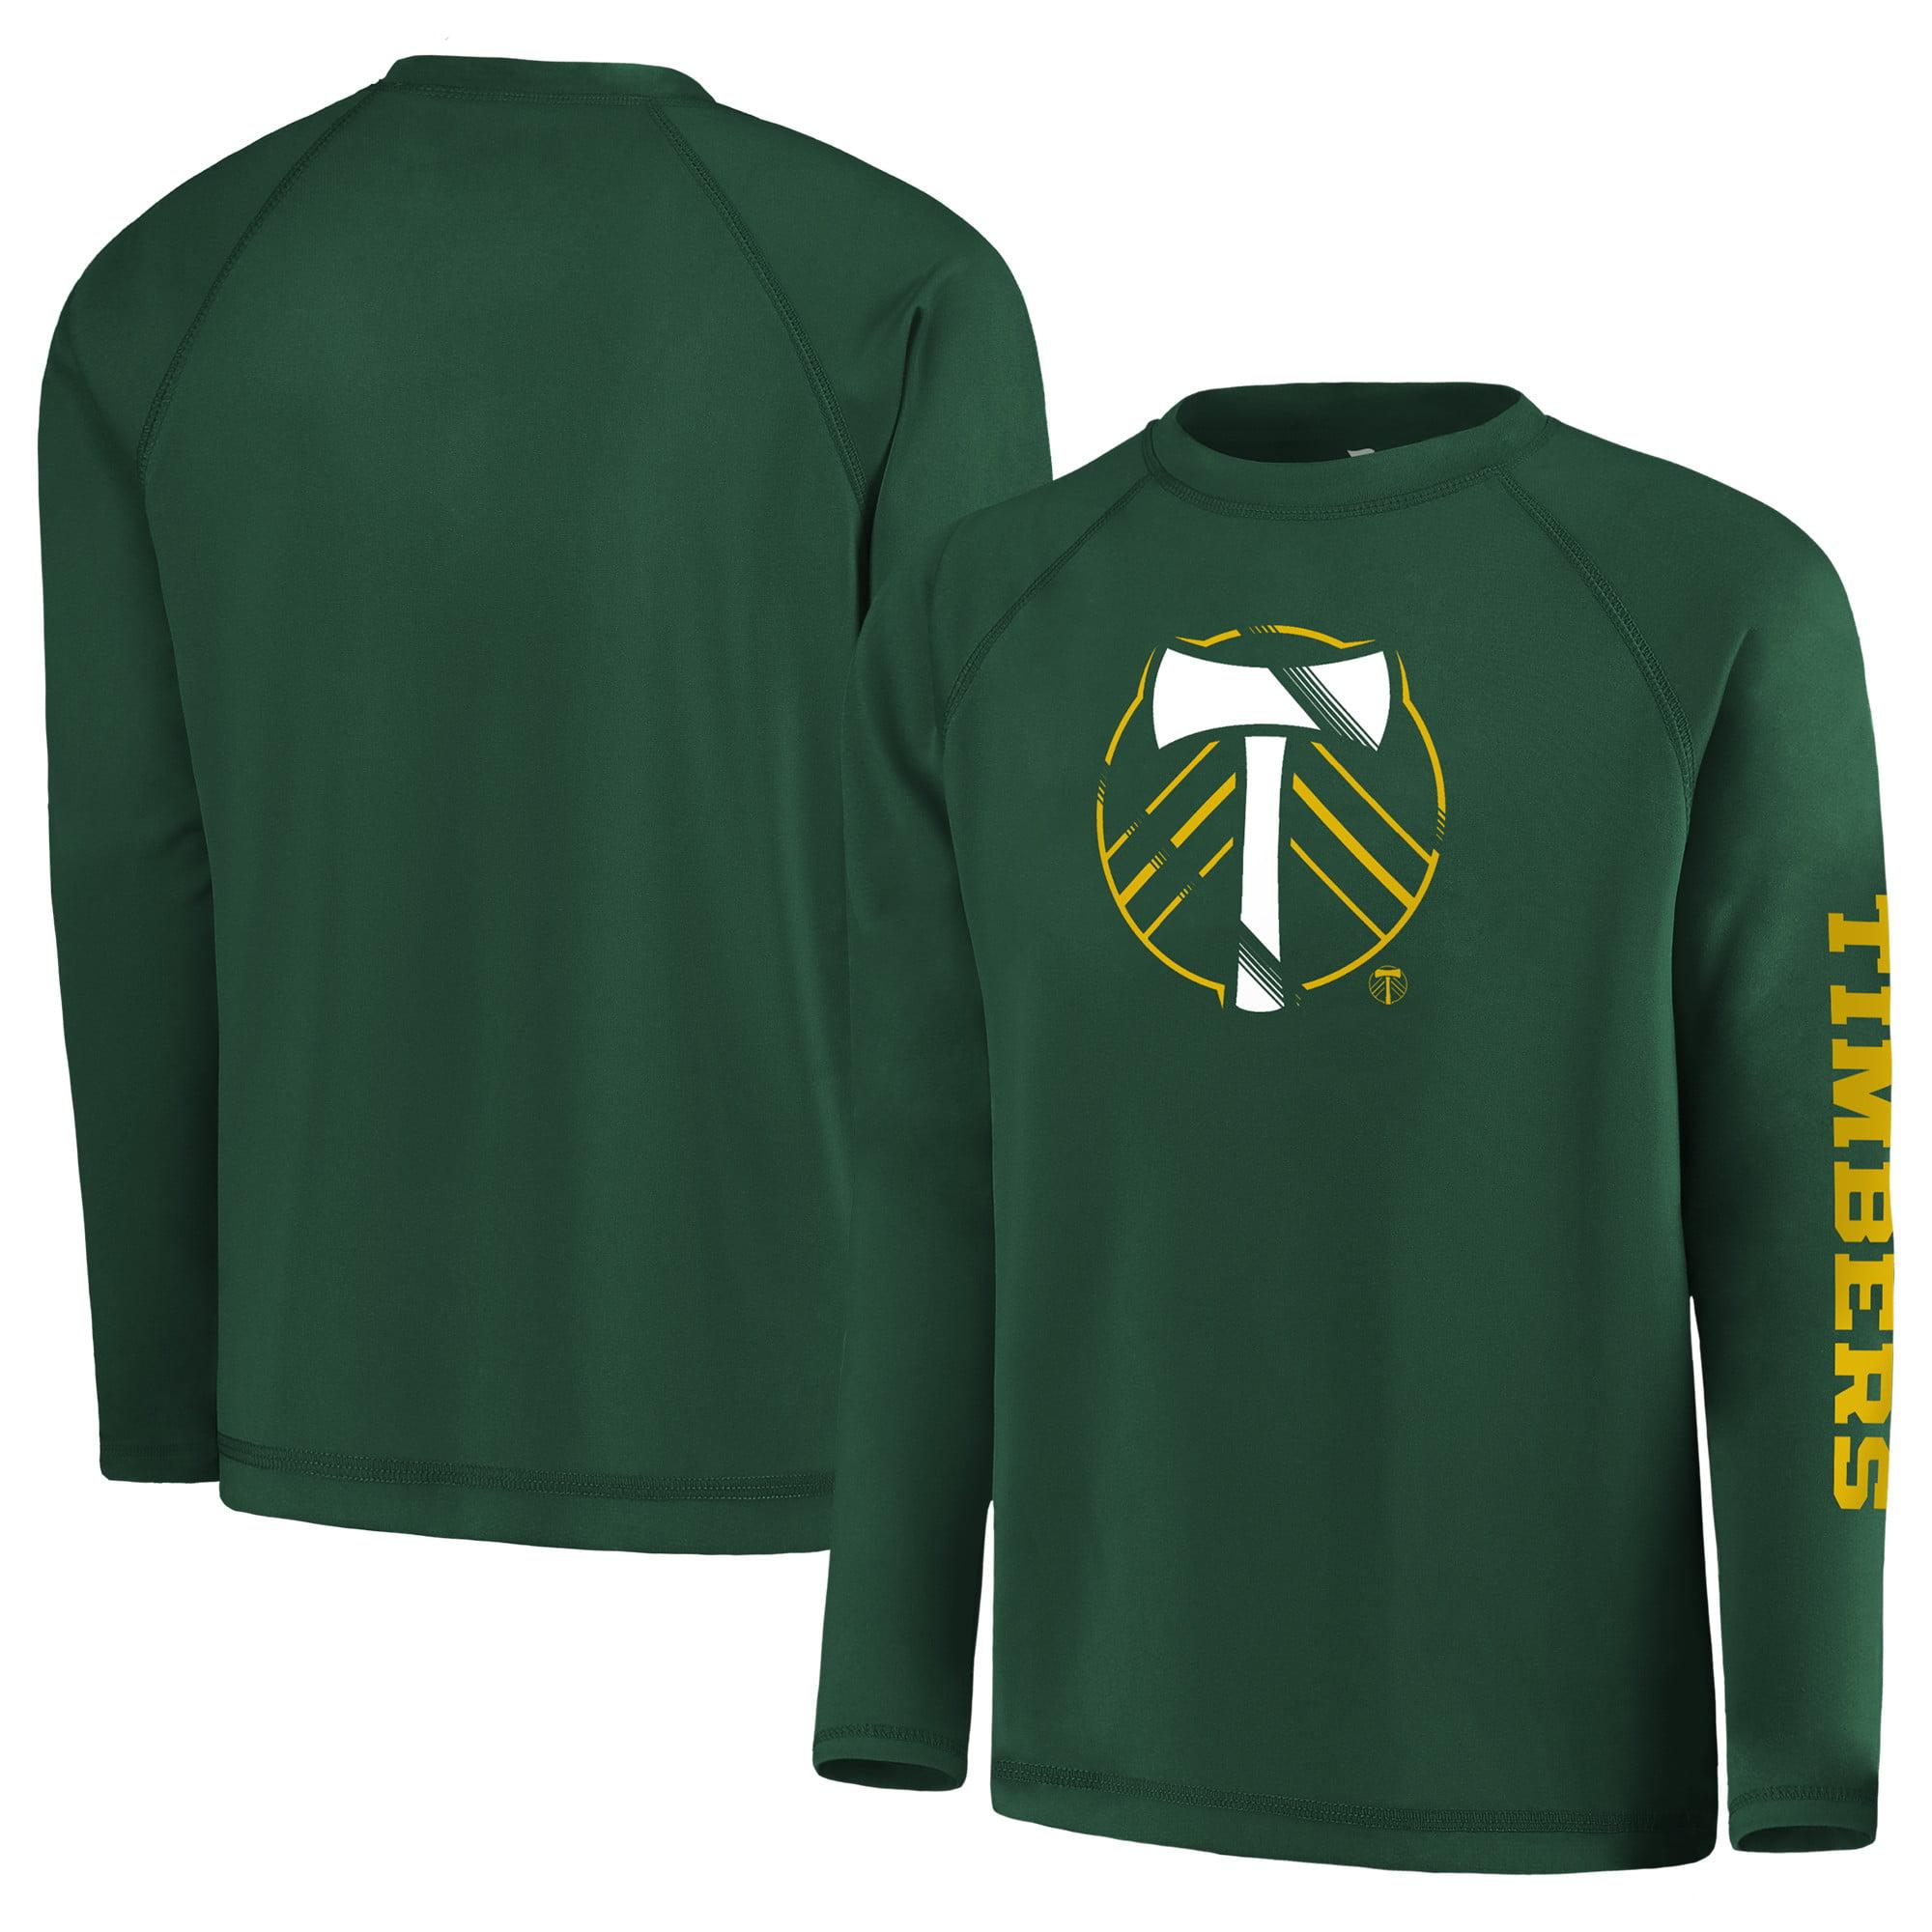 Portland Timbers Fanatics Branded Youth Vital to Success Long Sleeve T-Shirt - Green